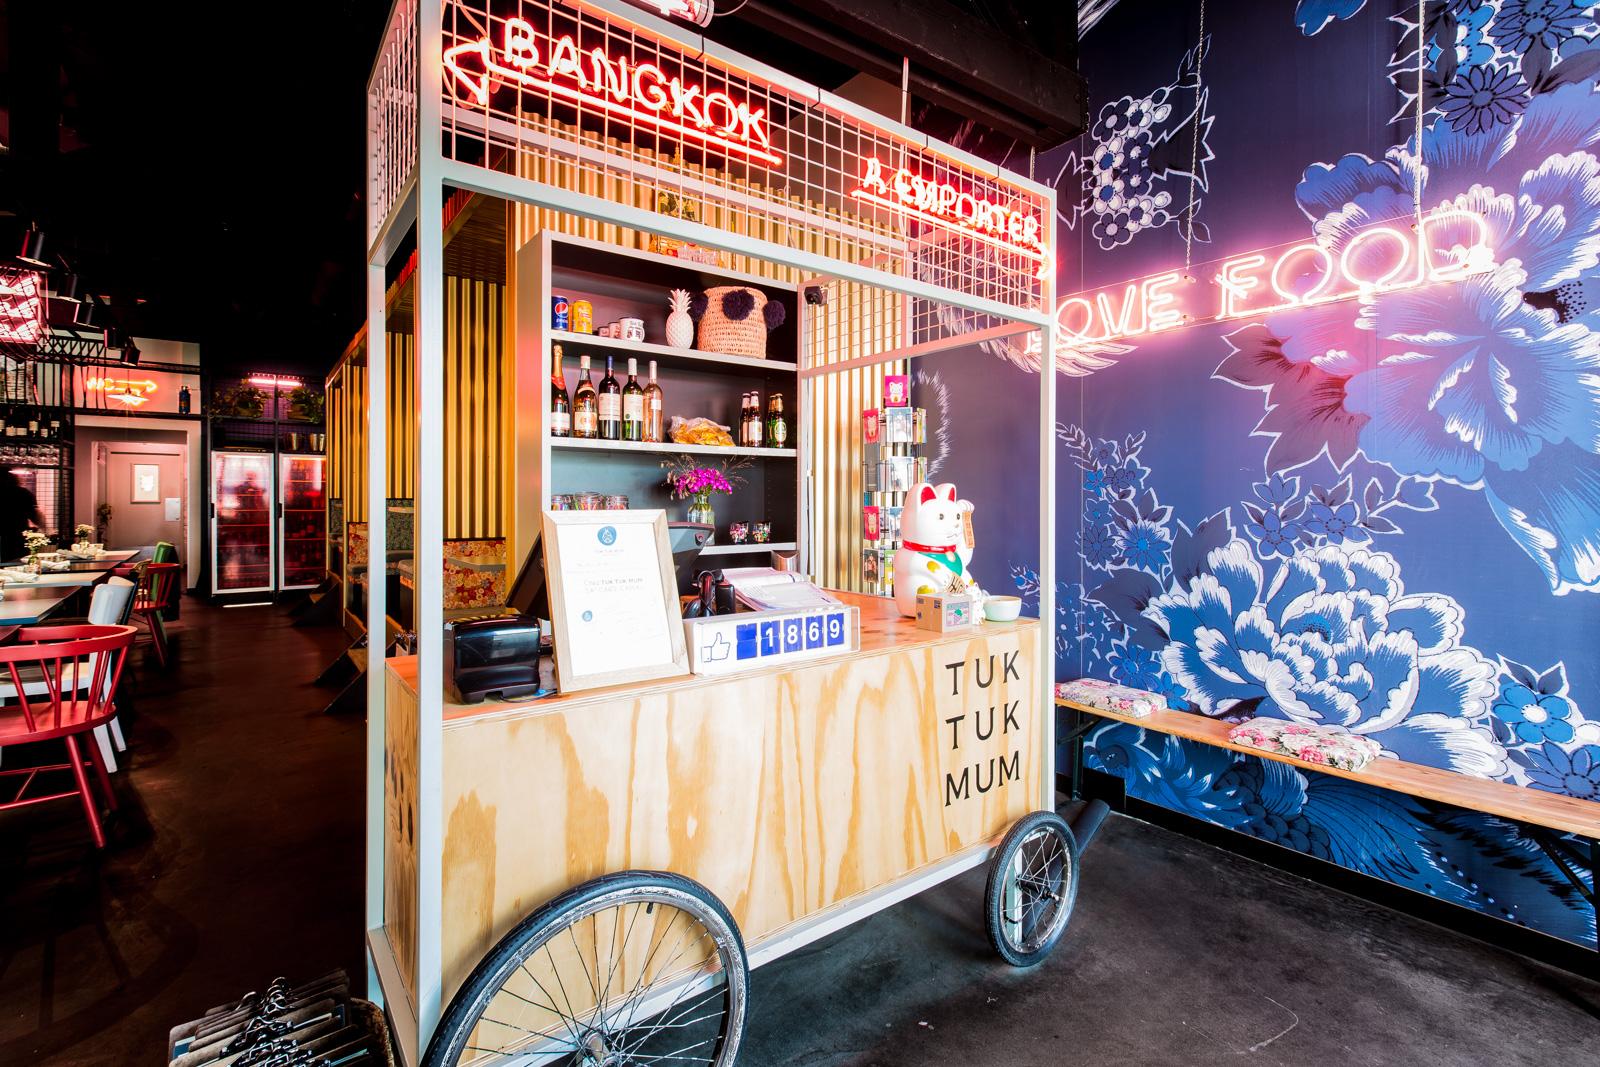 Tuktukmum Restaurant Thailandais Rennes